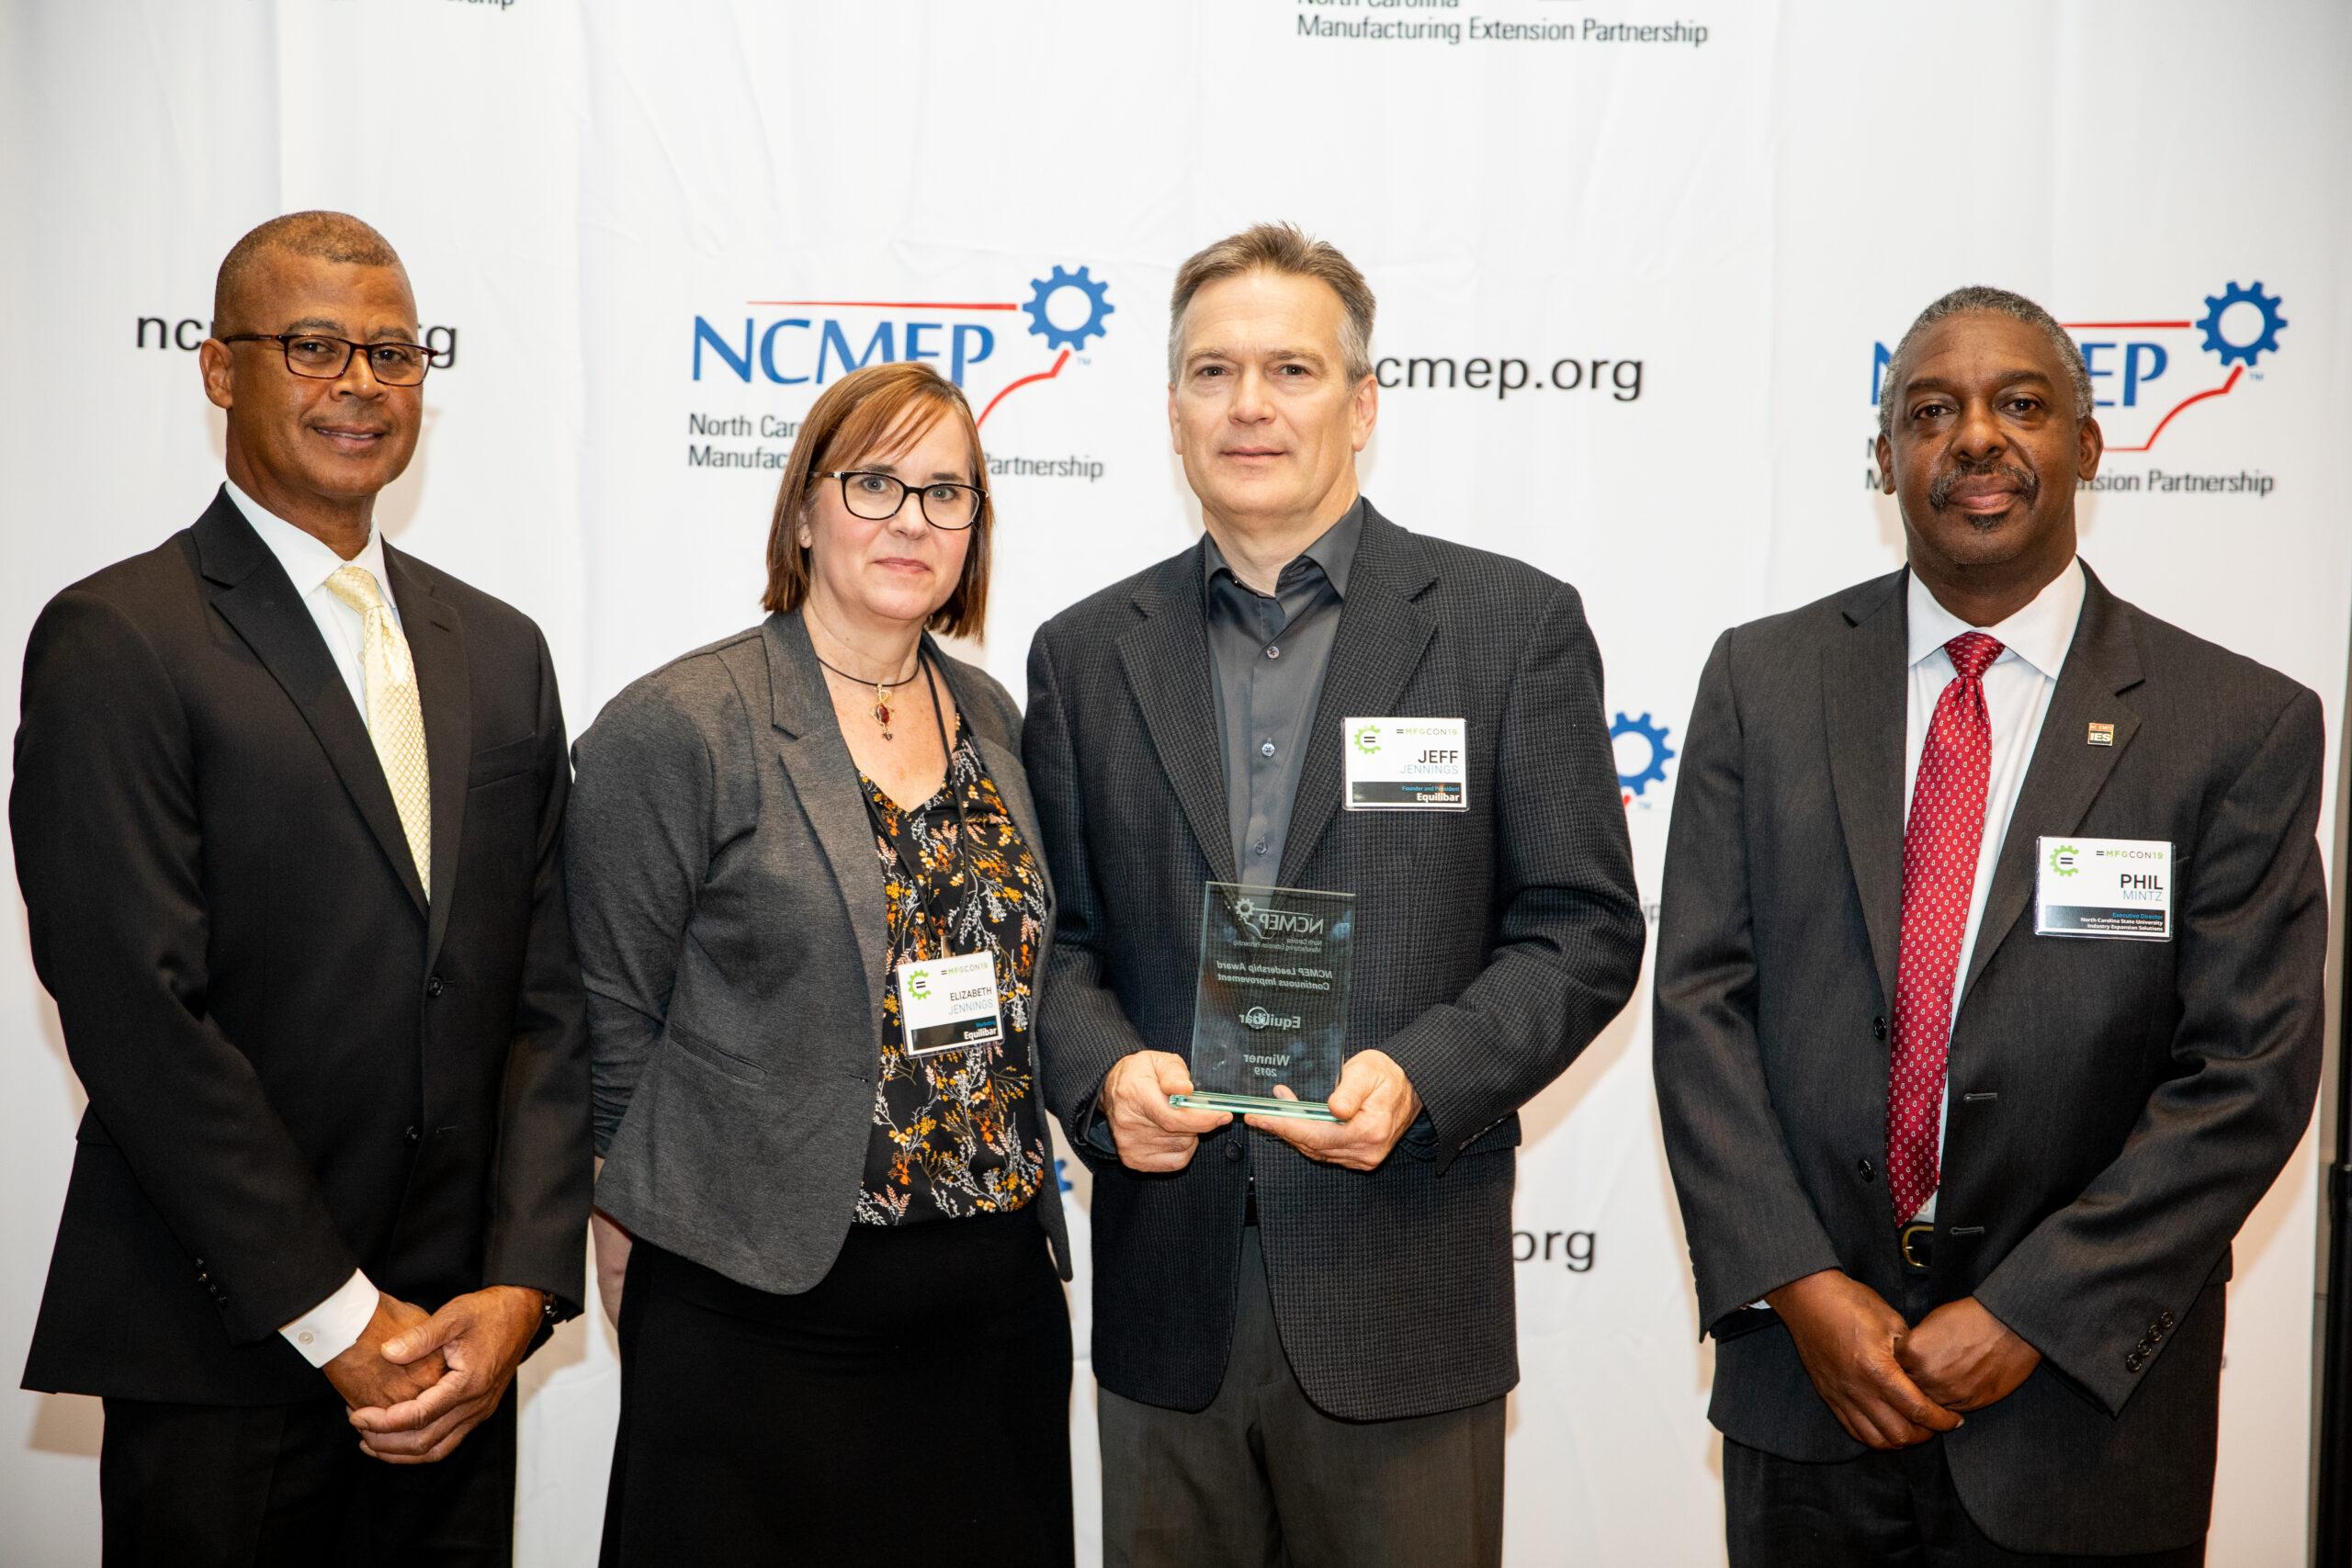 mfgCON19_Award-Winners-Equilibar Photo